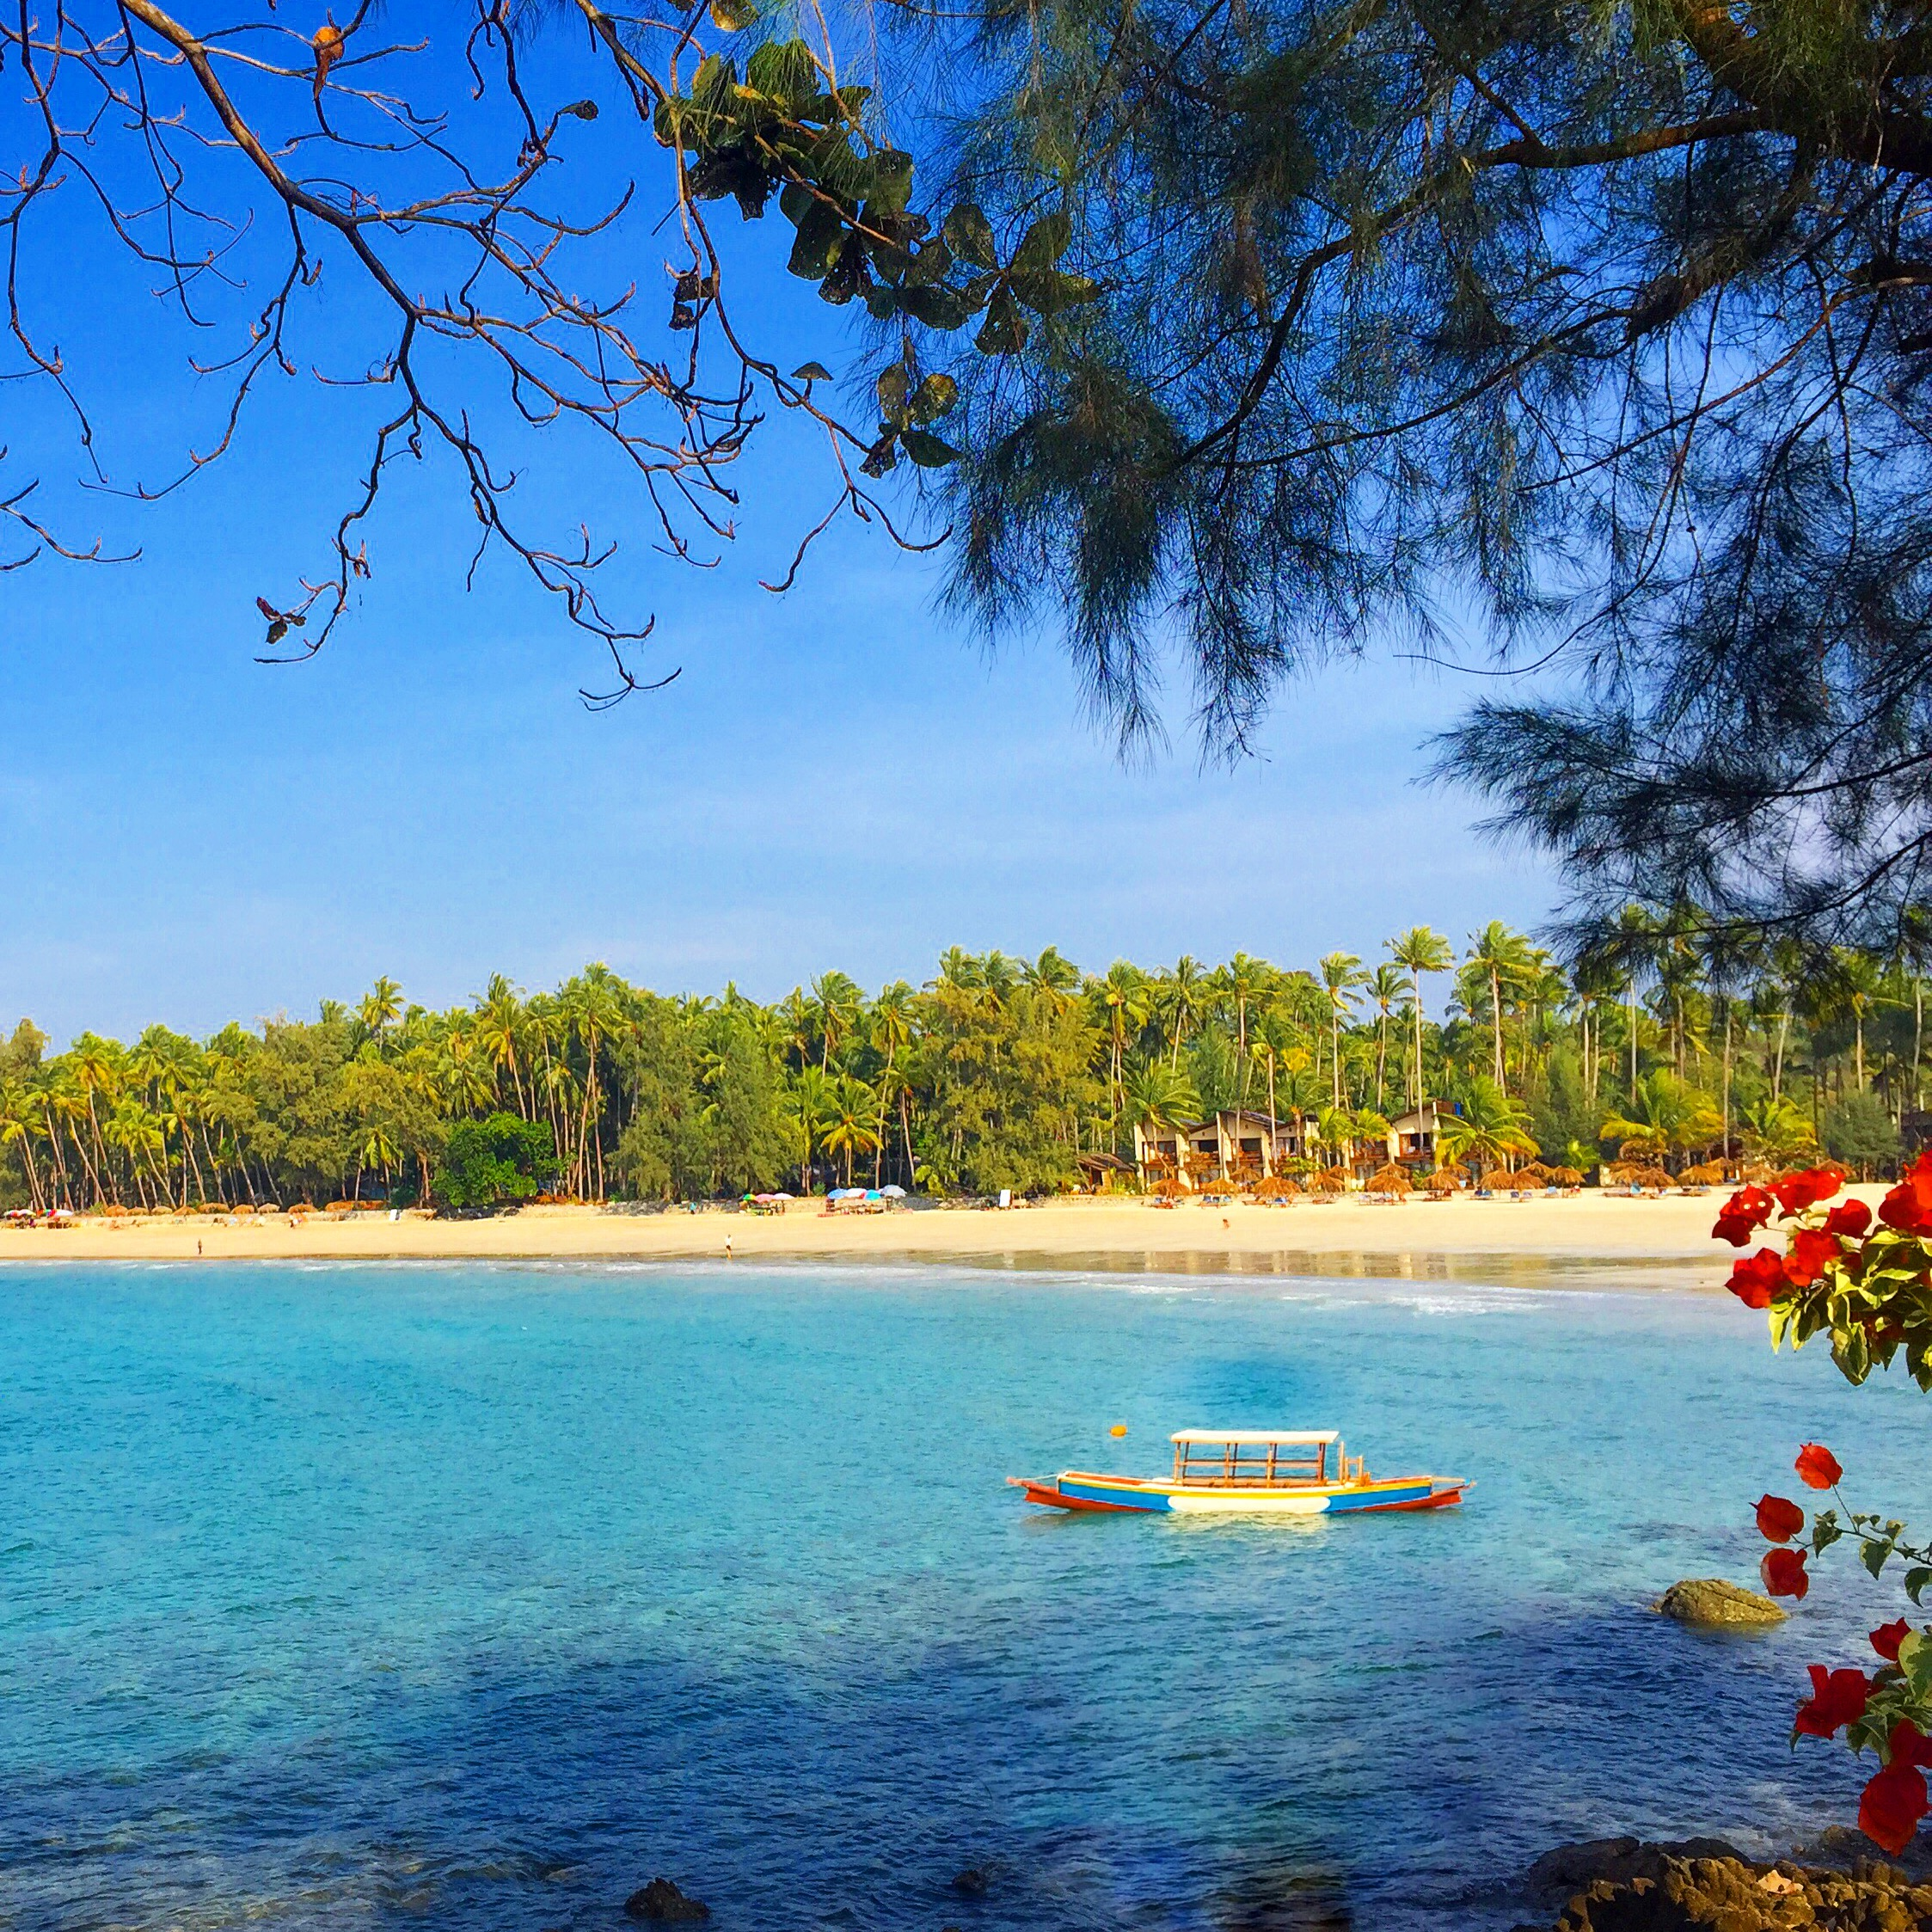 ngapali beach myanmar burma